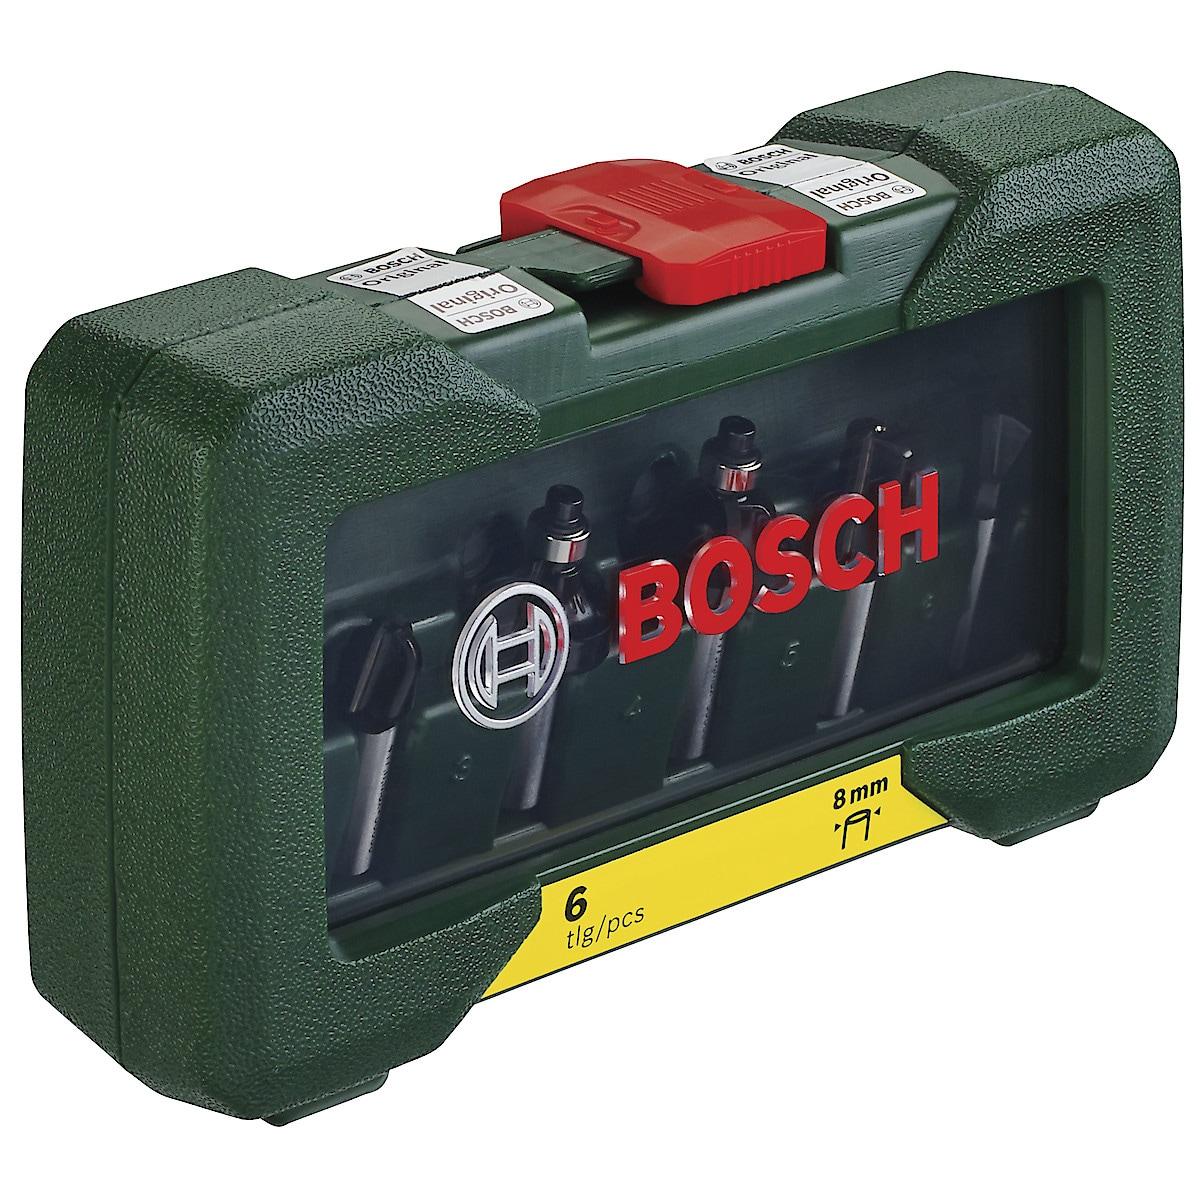 Bosch fresestål, 6 deler